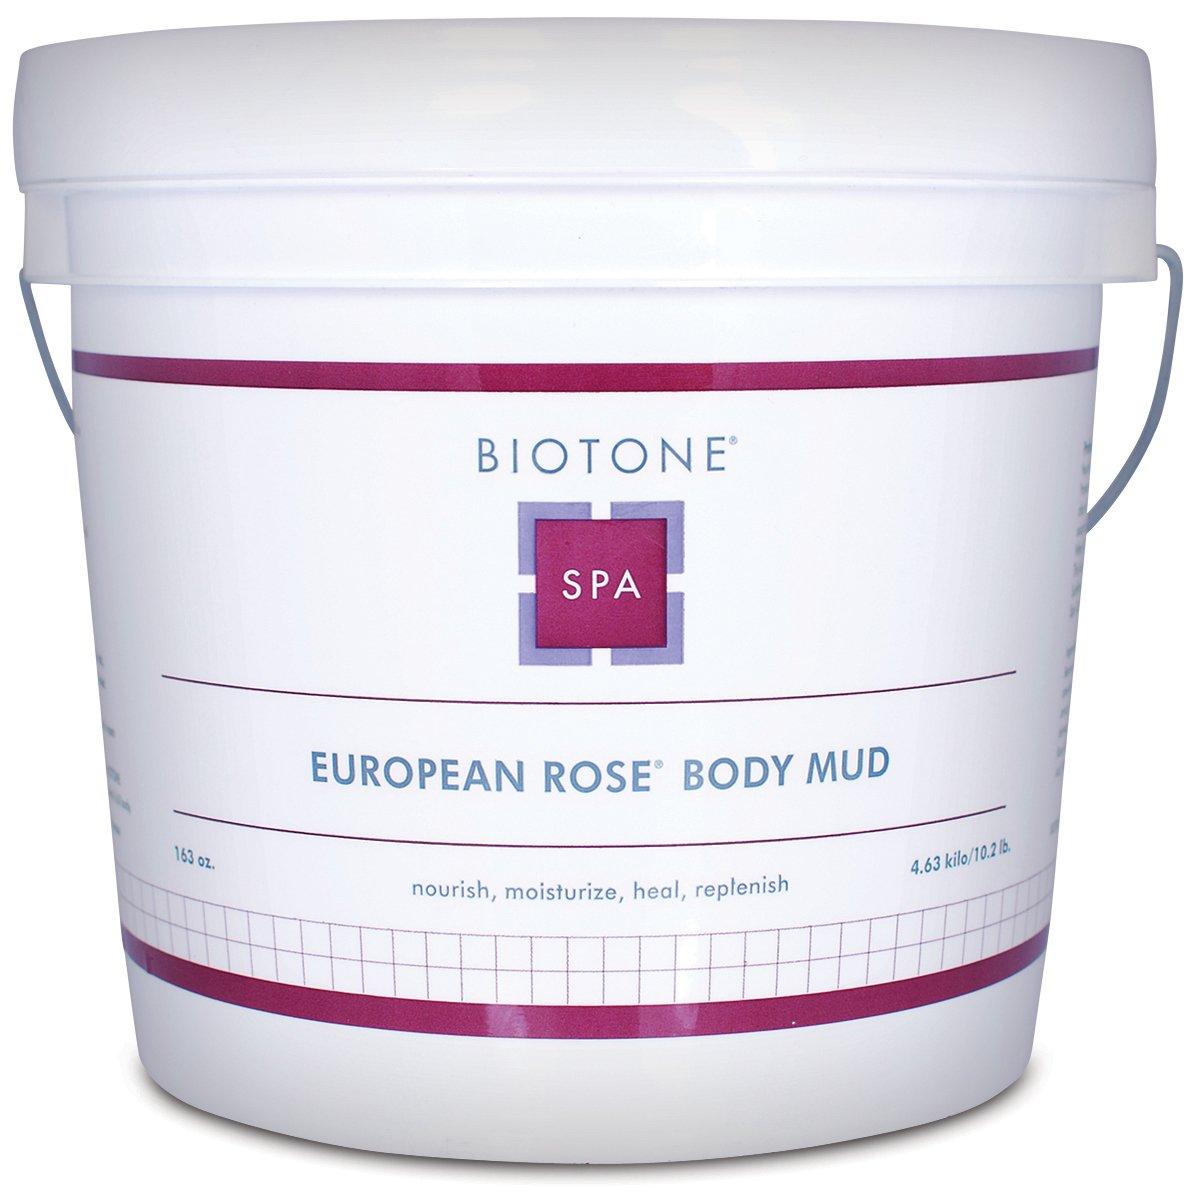 Biotone European Rose Body Mud, 163 Ounce